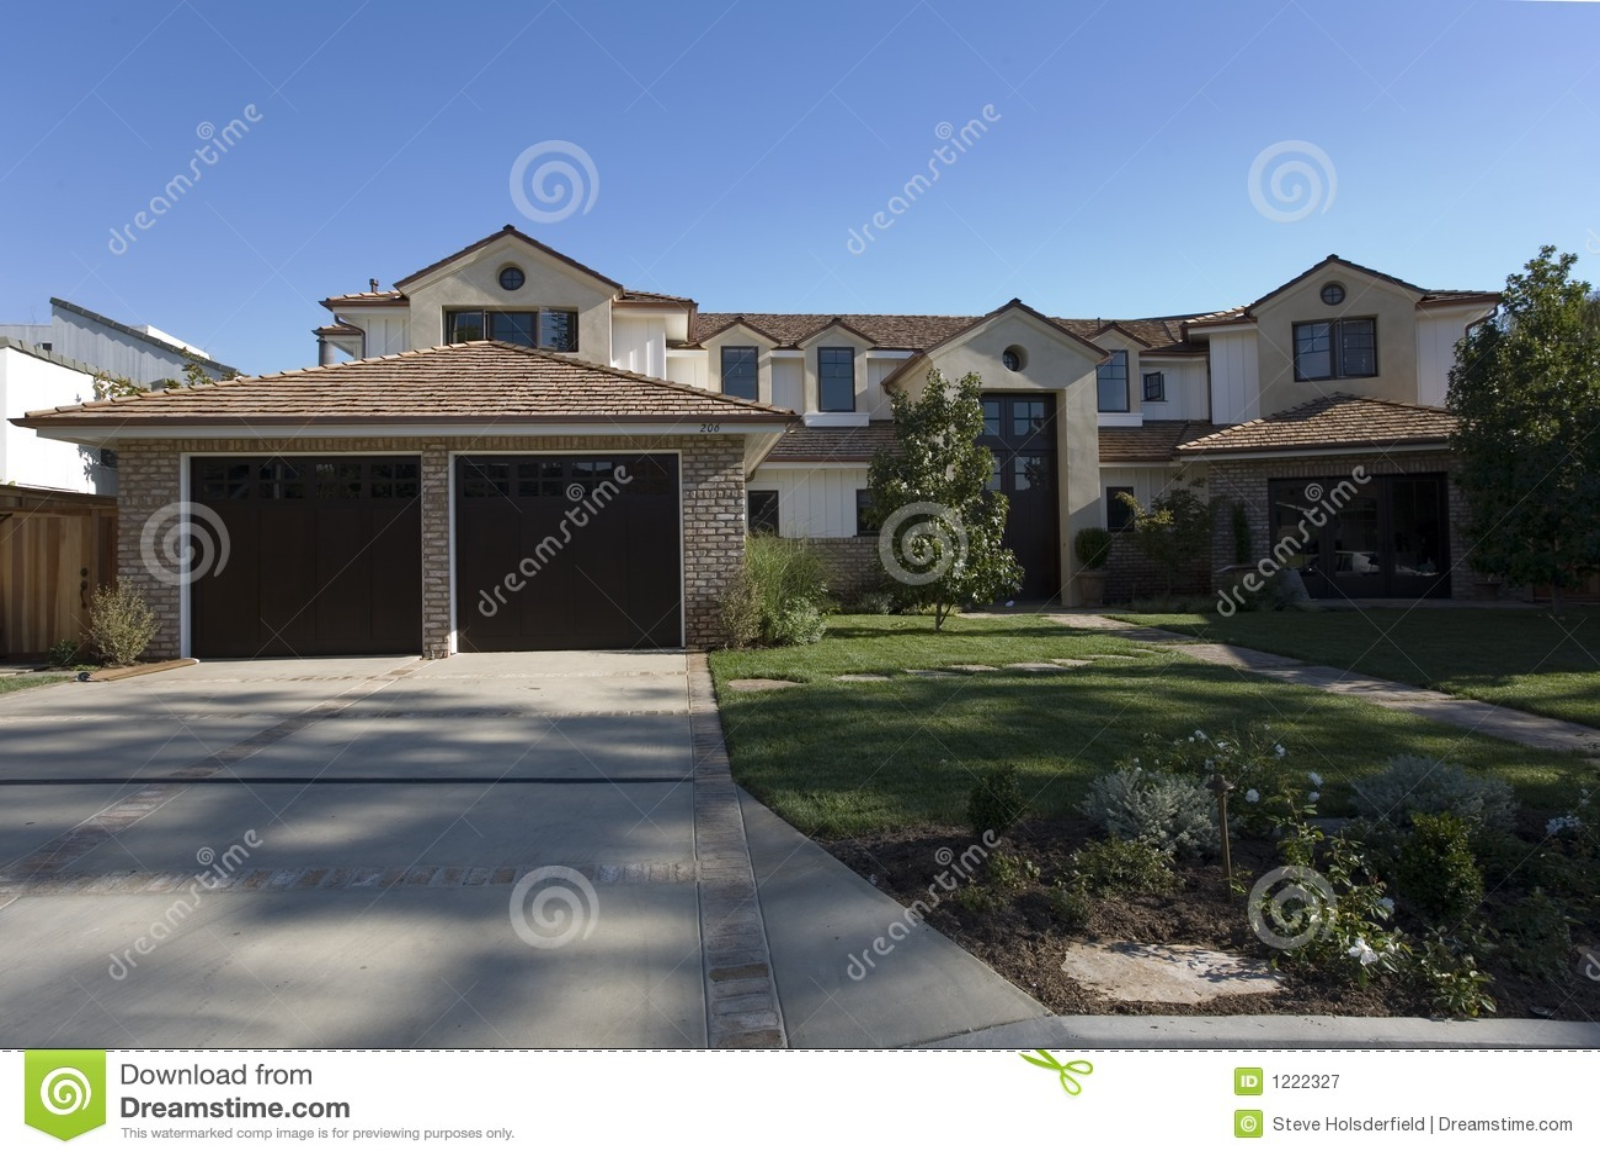 Custom Home In Newport Beach Ca Royalty Free Stock